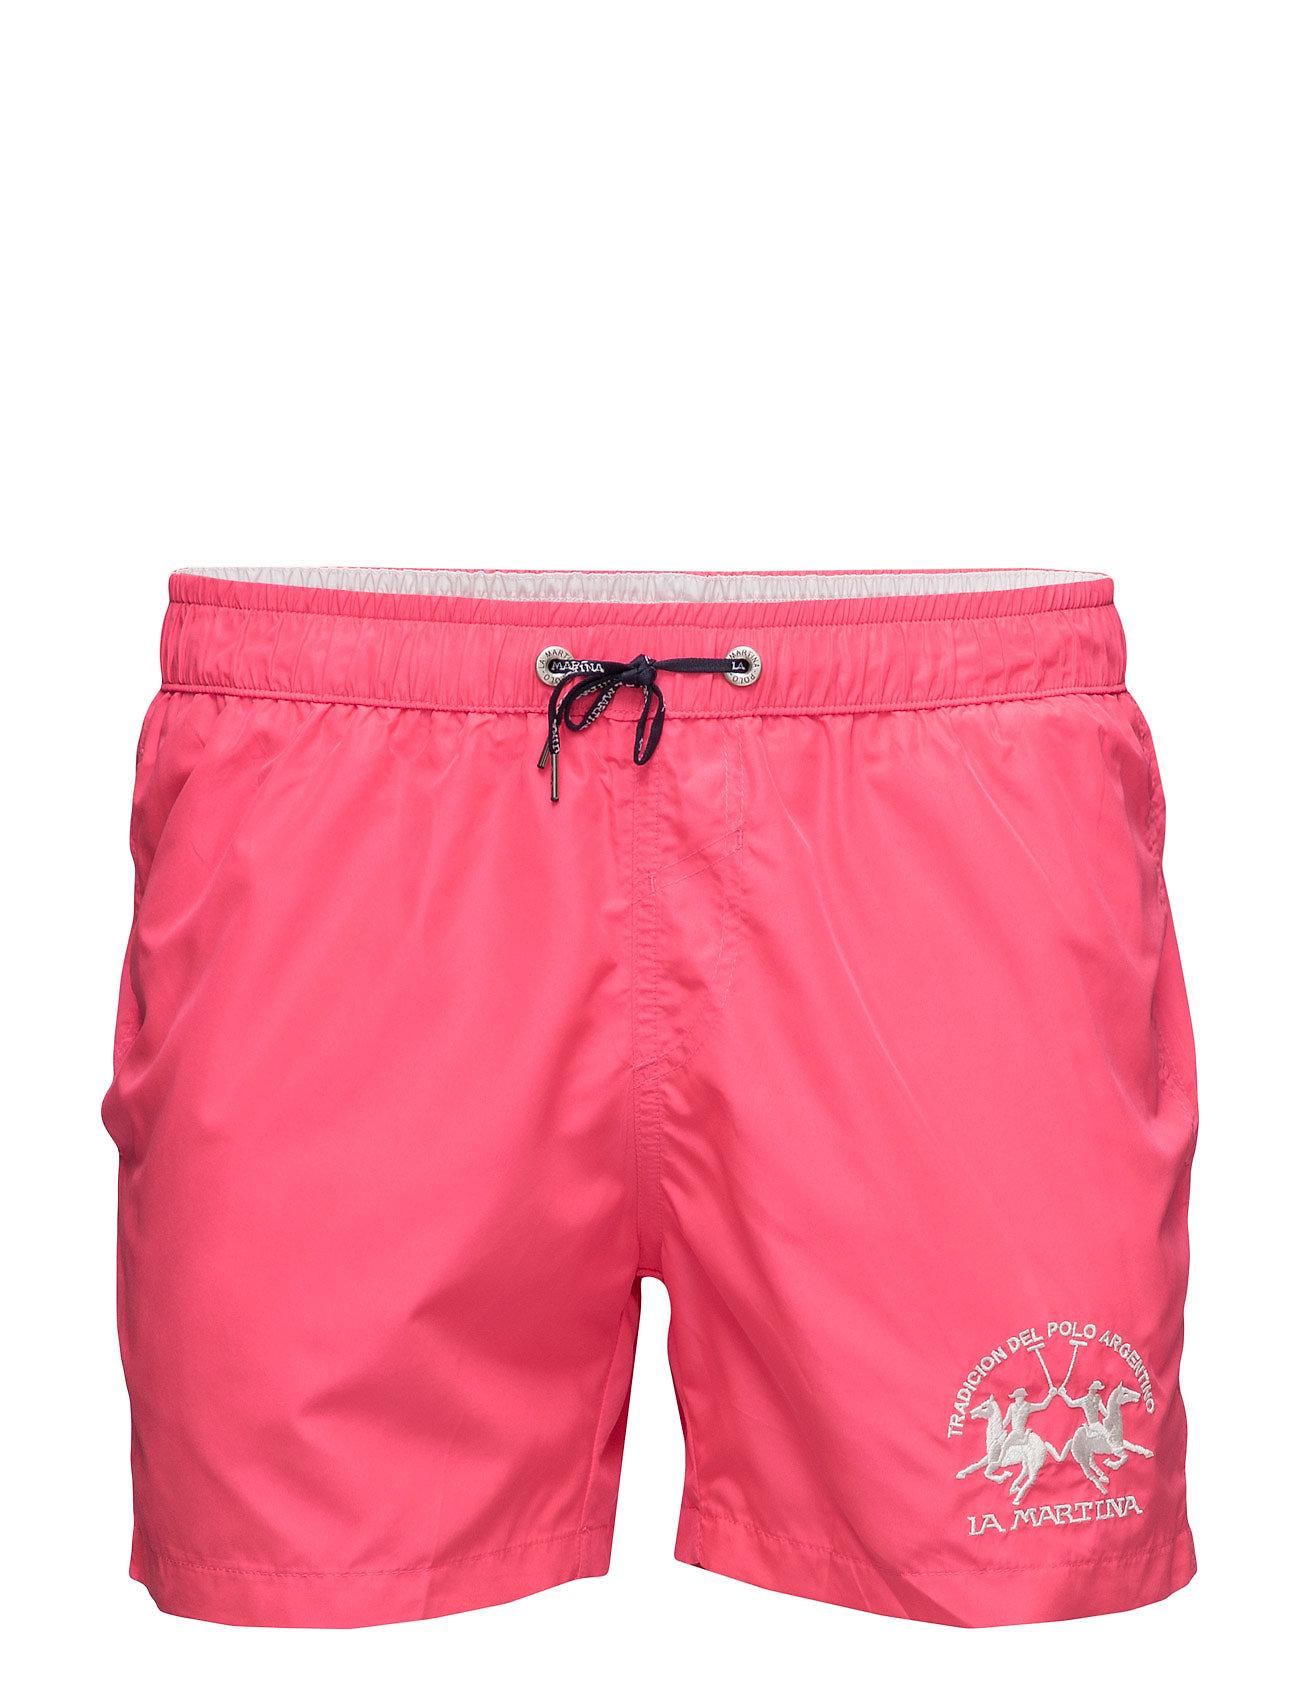 La Martina-Swimwear La Martina Shorts til Herrer i